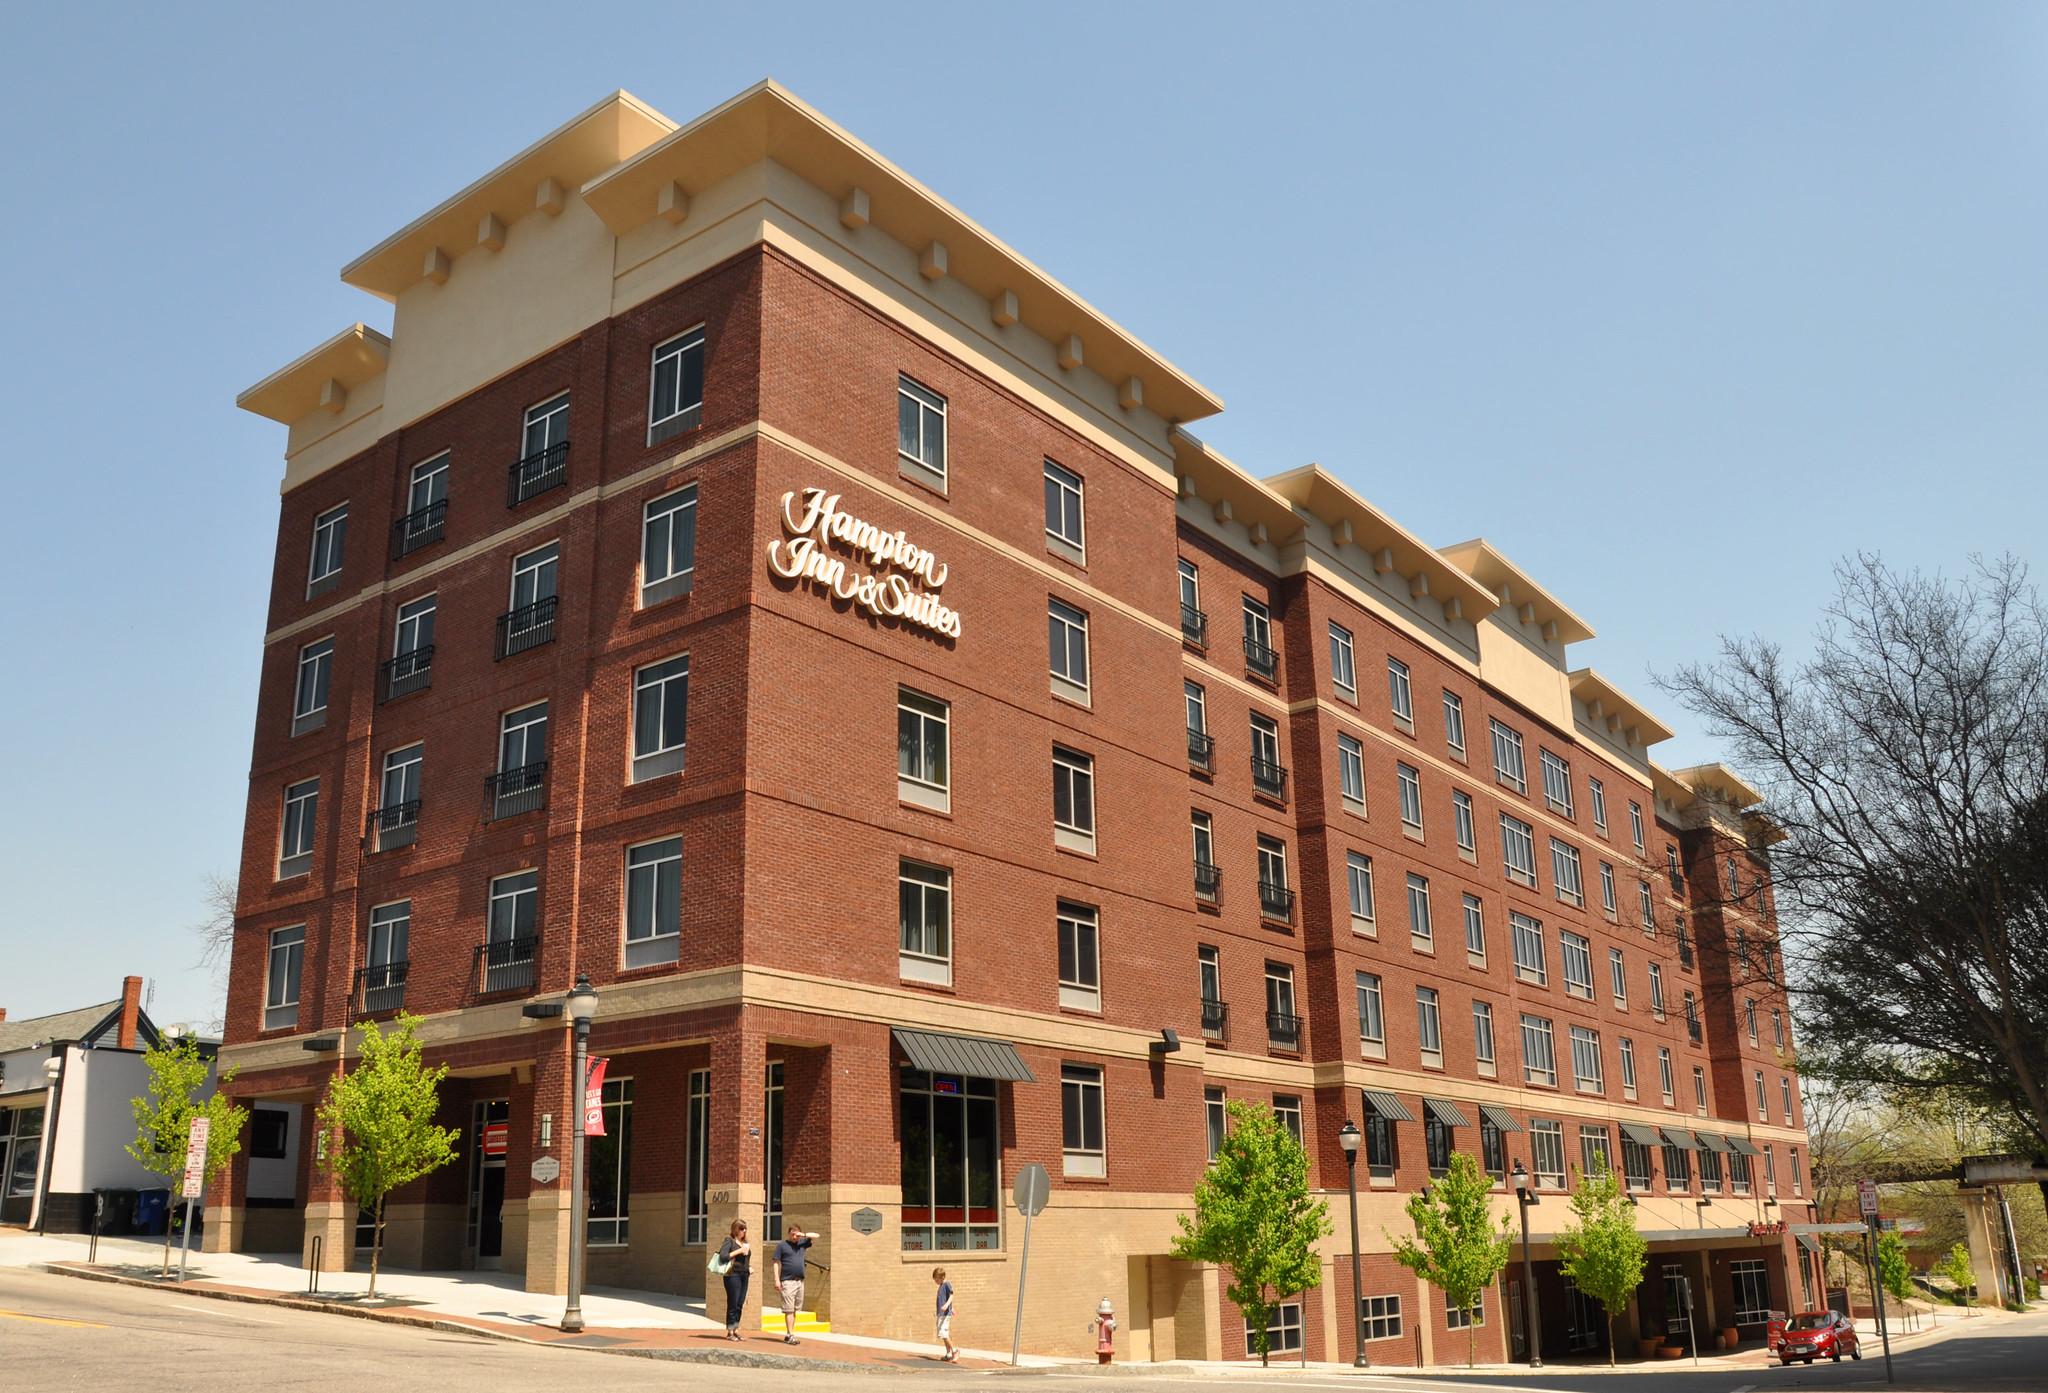 Hampton Inn Downtown Mobile Alabama Hotel